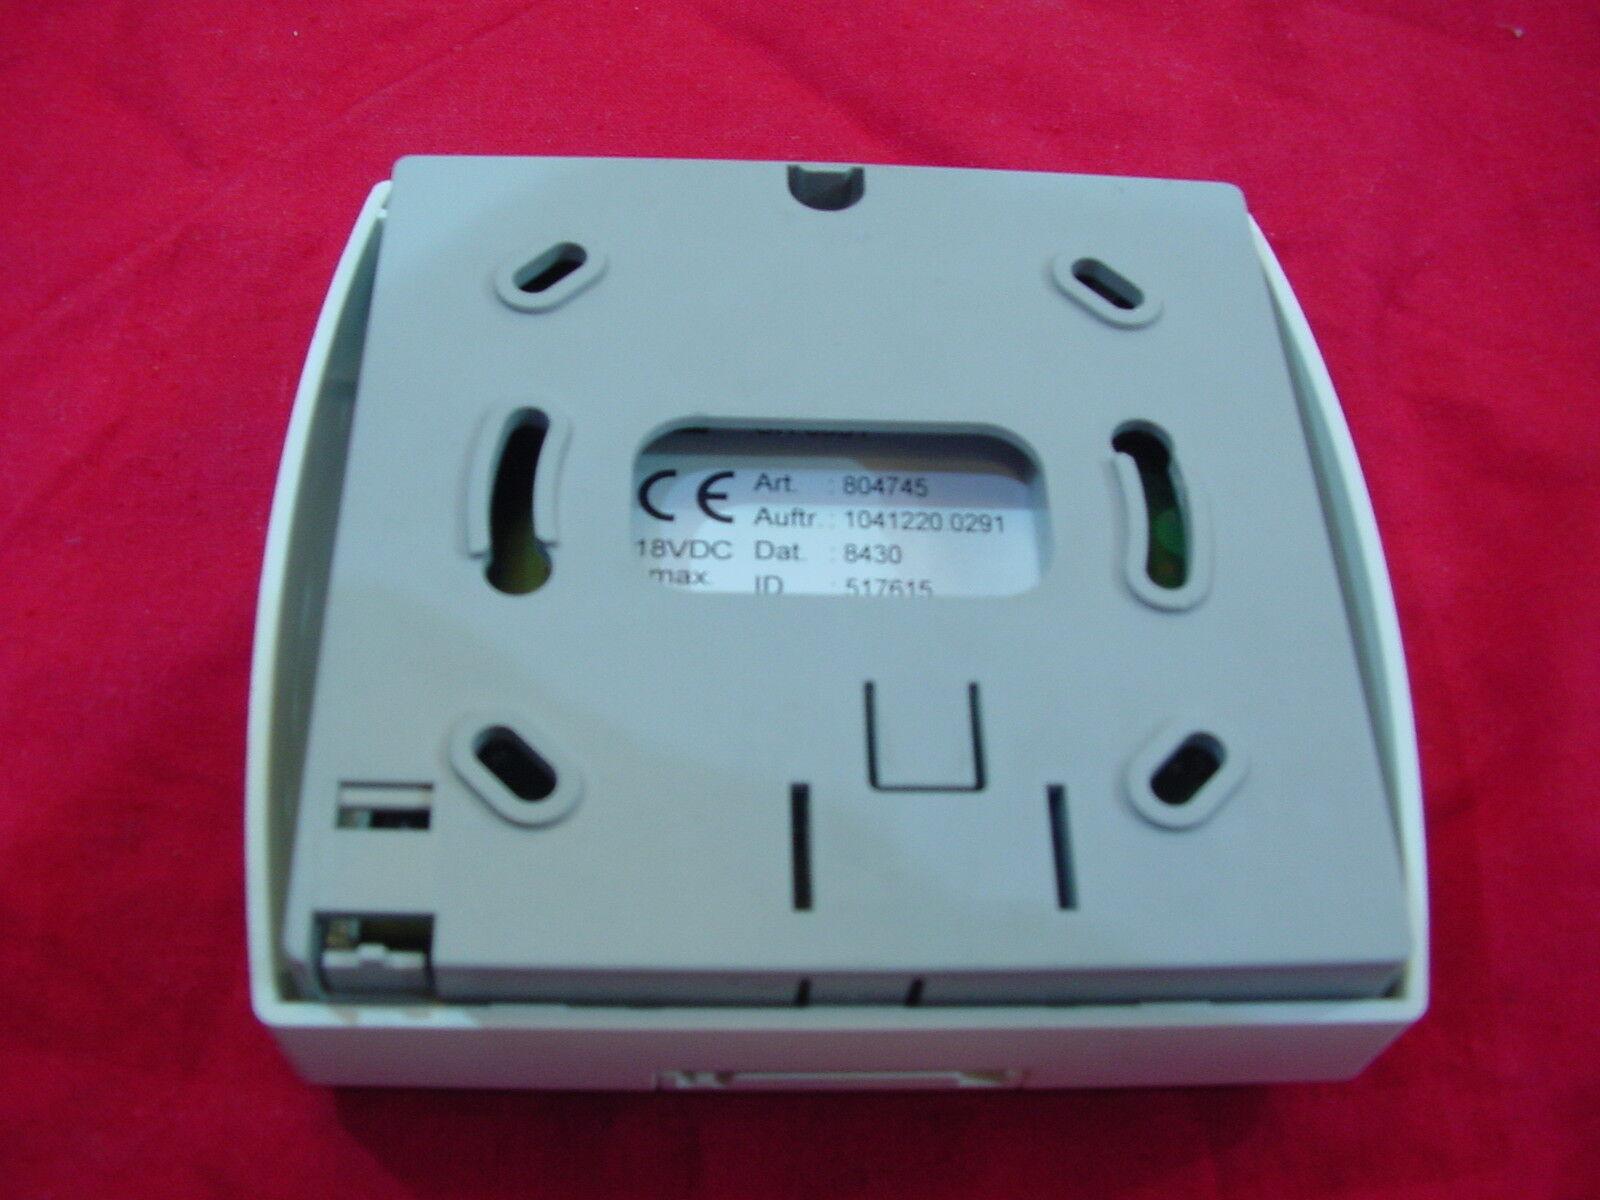 Cenvax Energycontrol VAG 5000 > Steuerung/Heizung Steuerung/Heizung Steuerung/Heizung (19) Wandsteuerung  Klappe los 9e0659